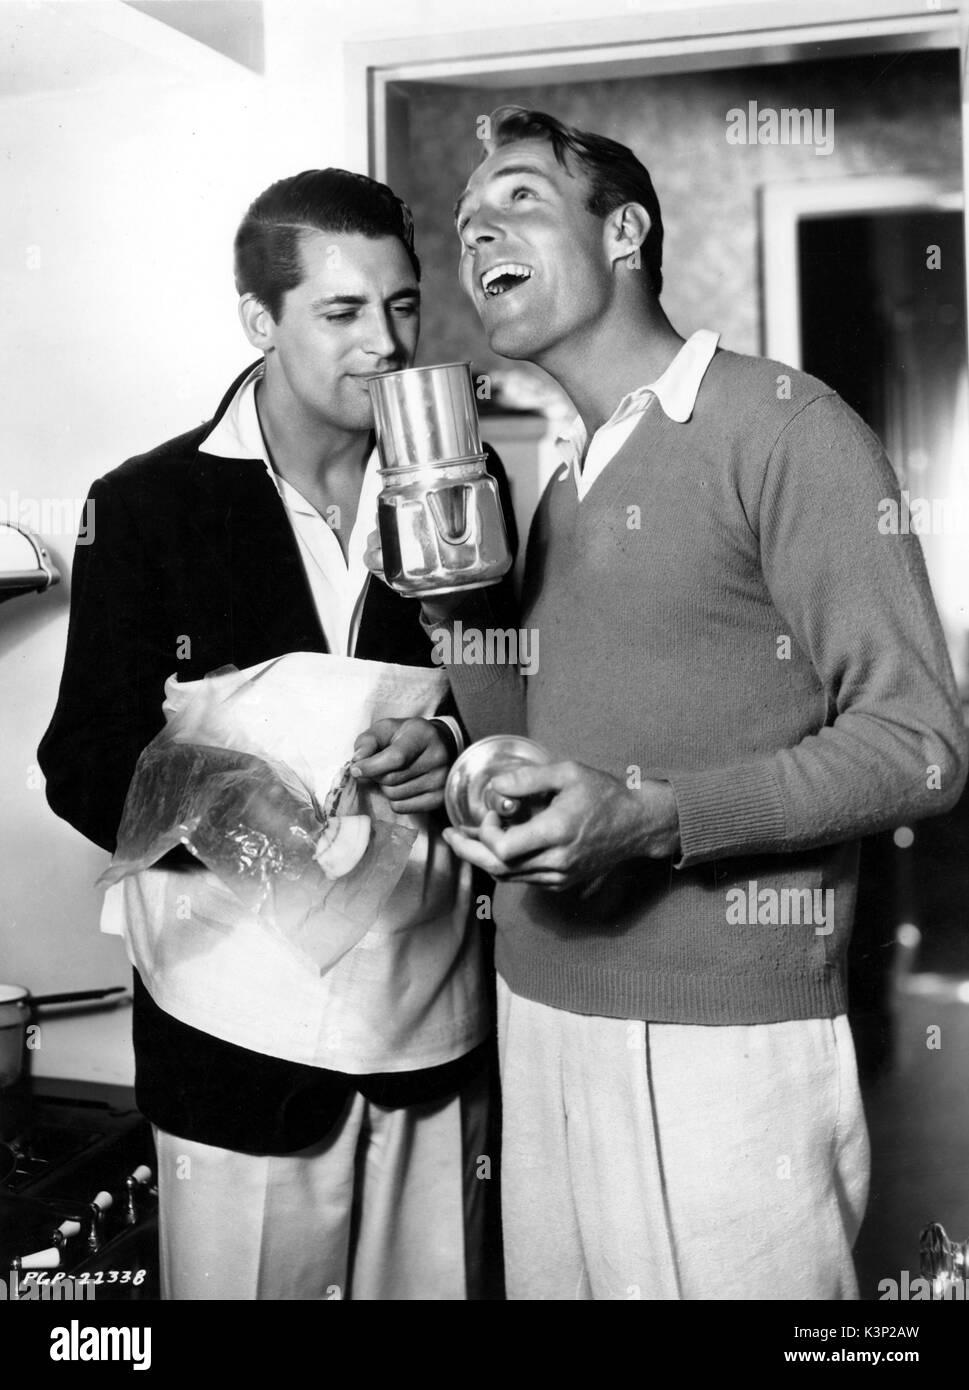 Cary grant and randolph scott photo Pride Month: Cary Grant and Randolph ScottA Hollywood Gay